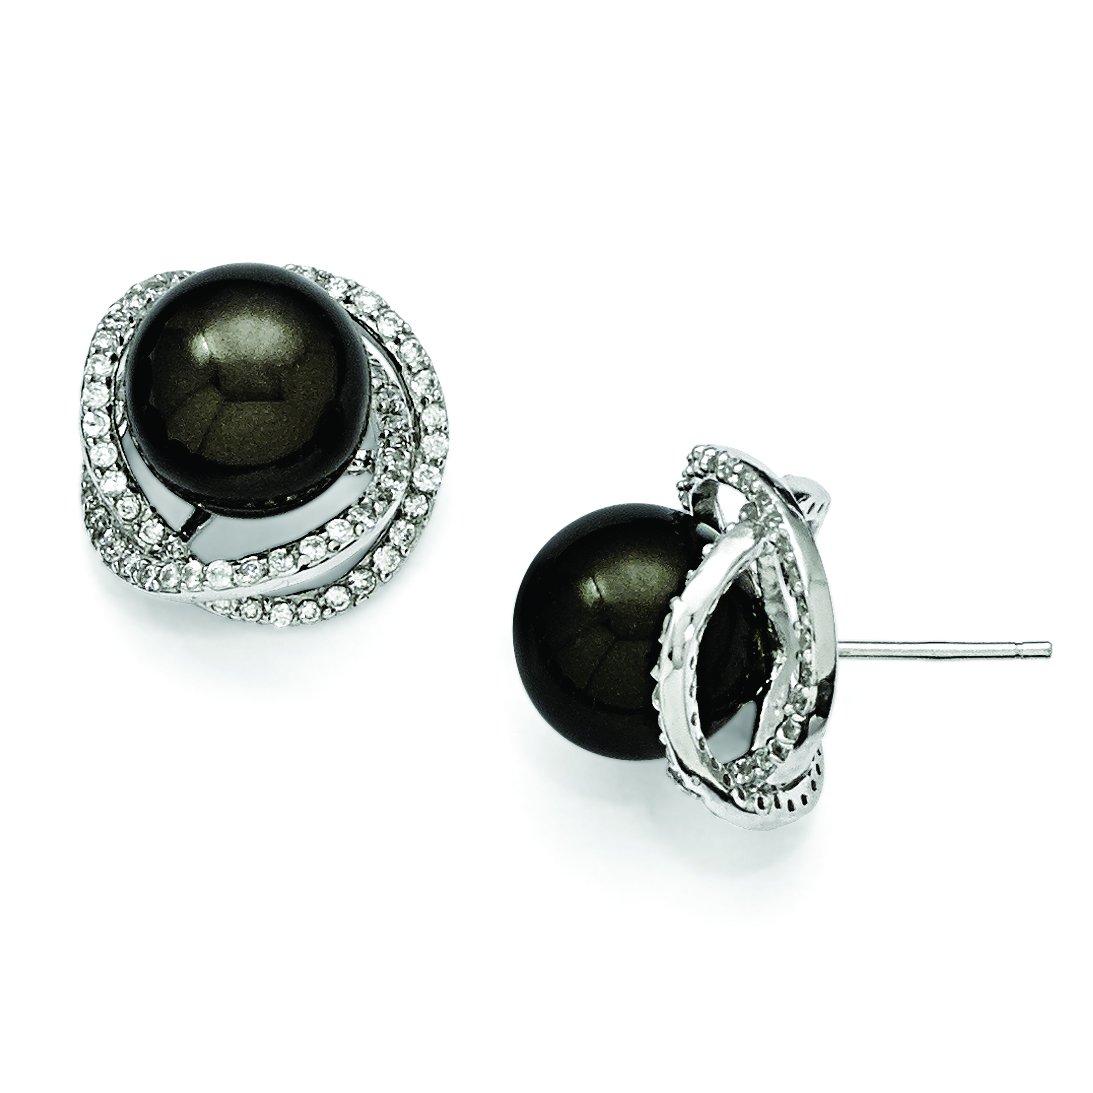 ICE CARATS 925 Sterling Silver Majestik 11mm Black Shell Bead Cubic Zirconia Cz Post Stud Ball Button Earrings Fine Jewelry Gift Set For Women Heart